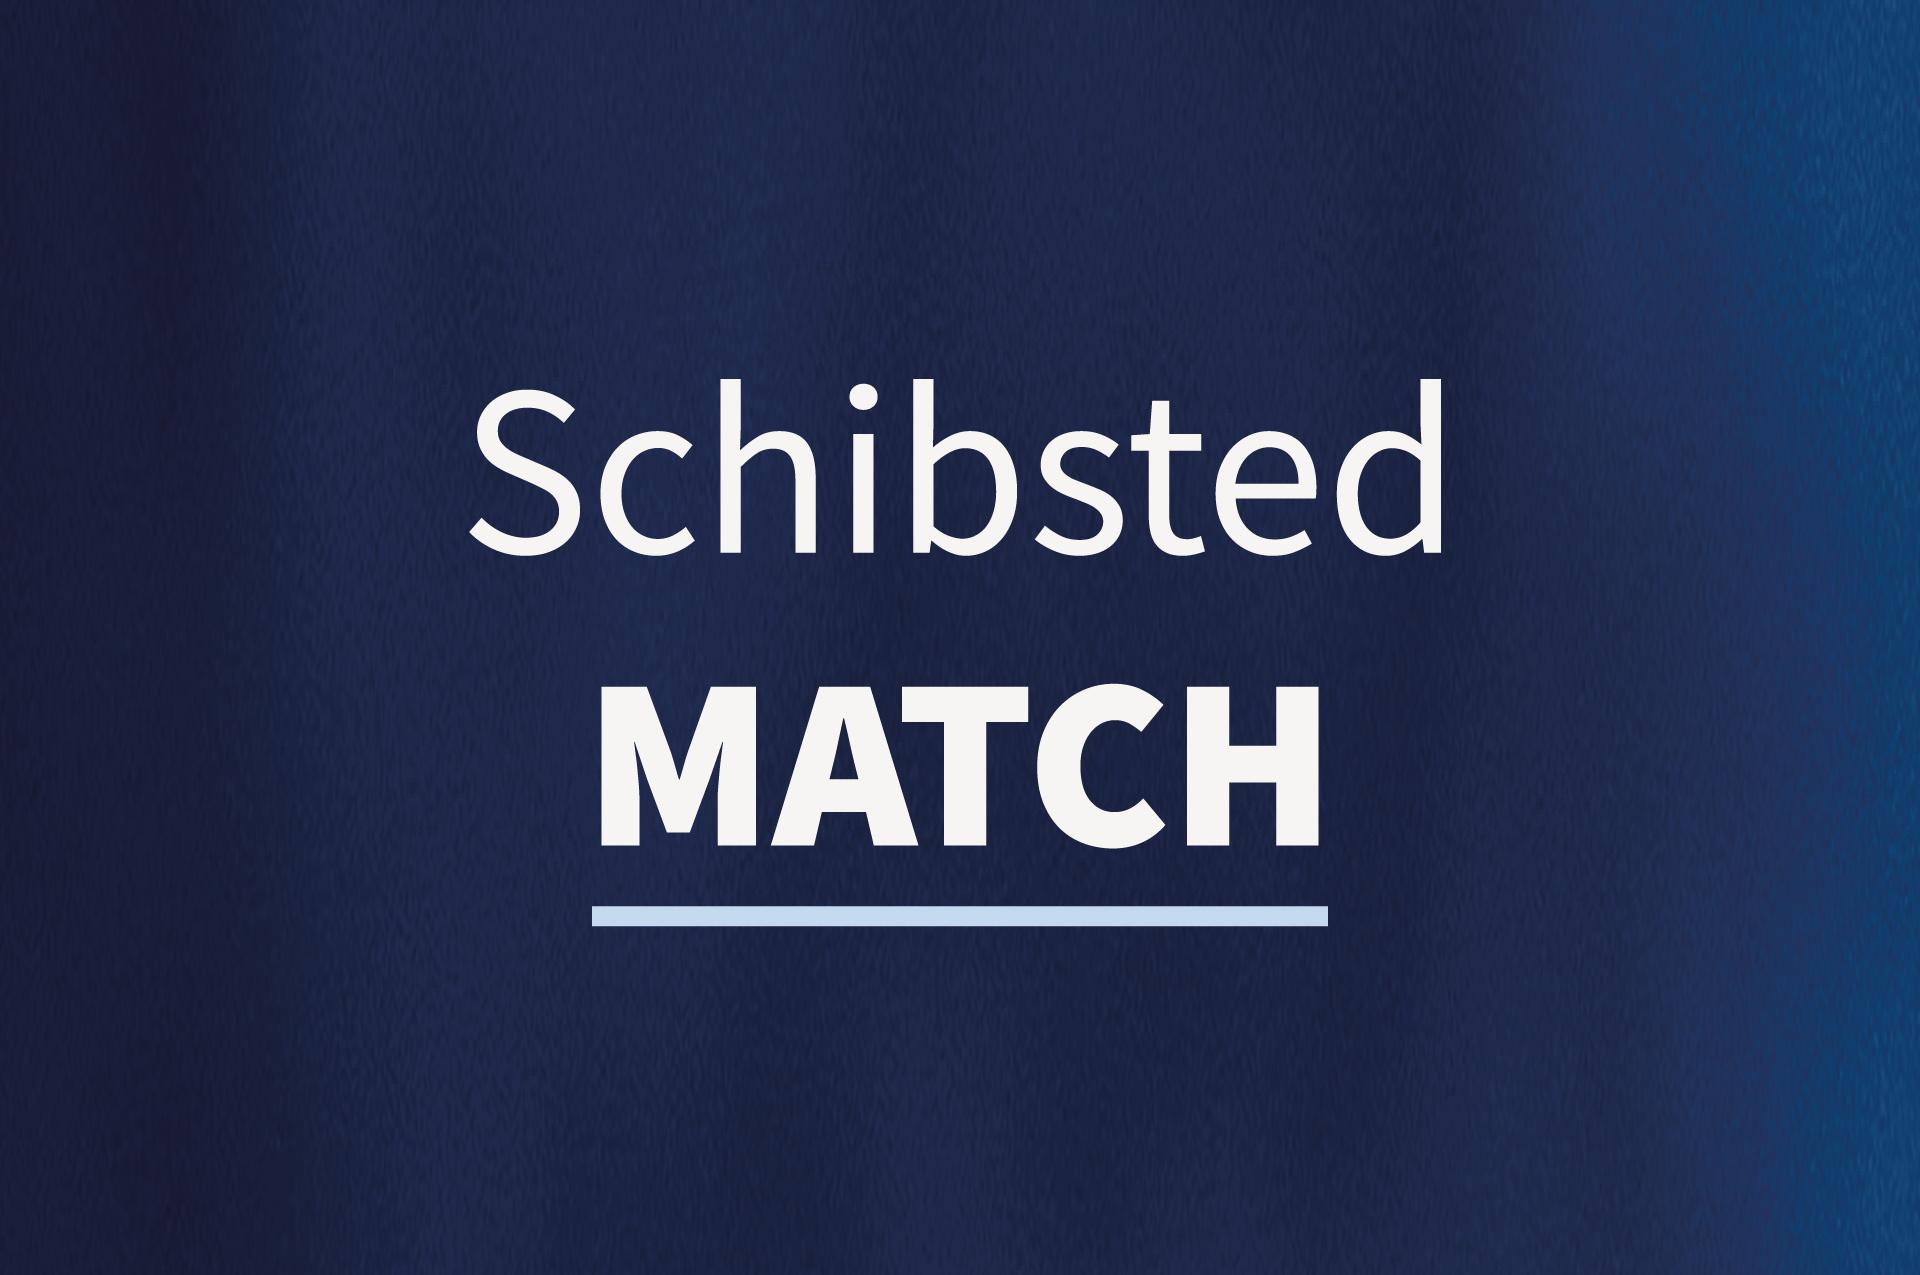 Schibsted Match